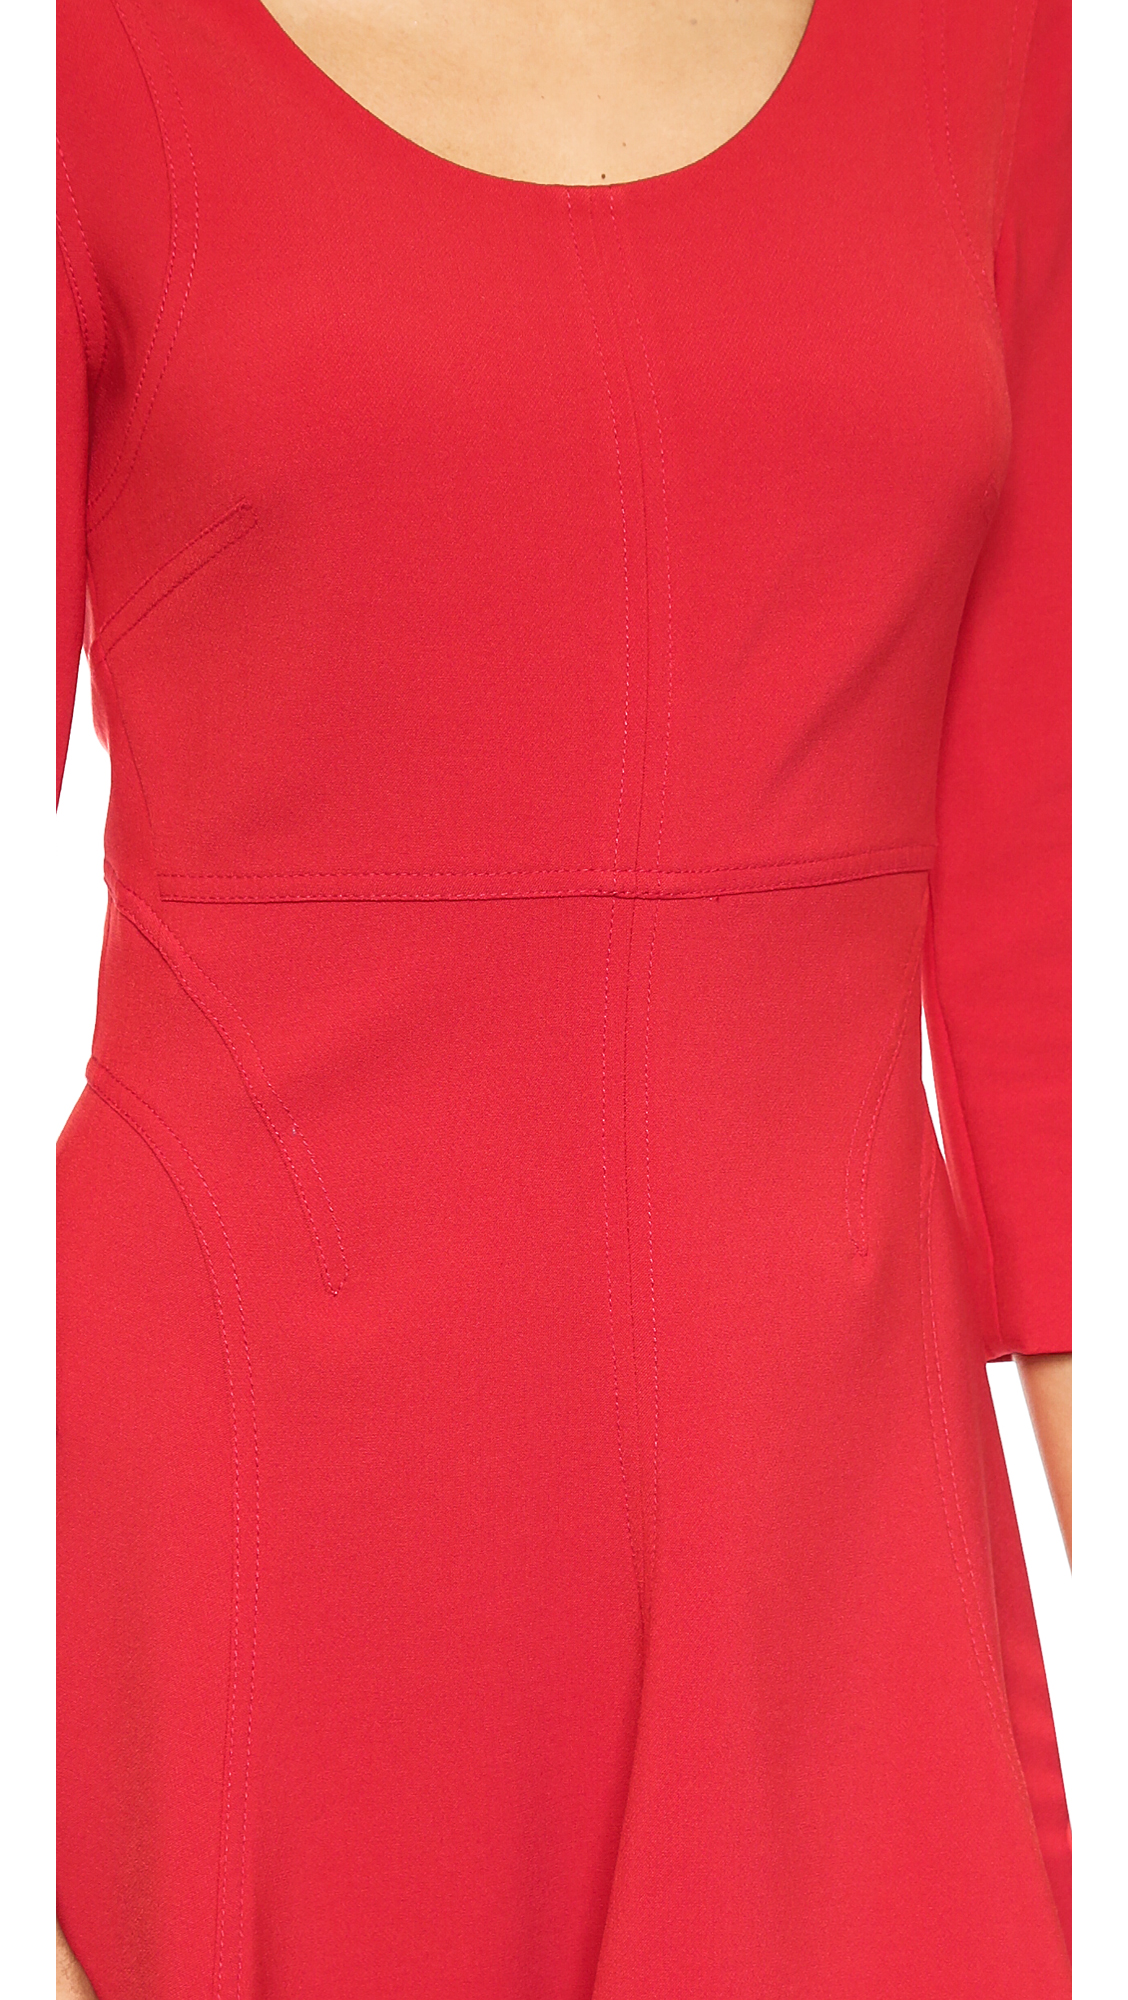 6ab0e4804de Diane von Furstenberg Paloma Dress